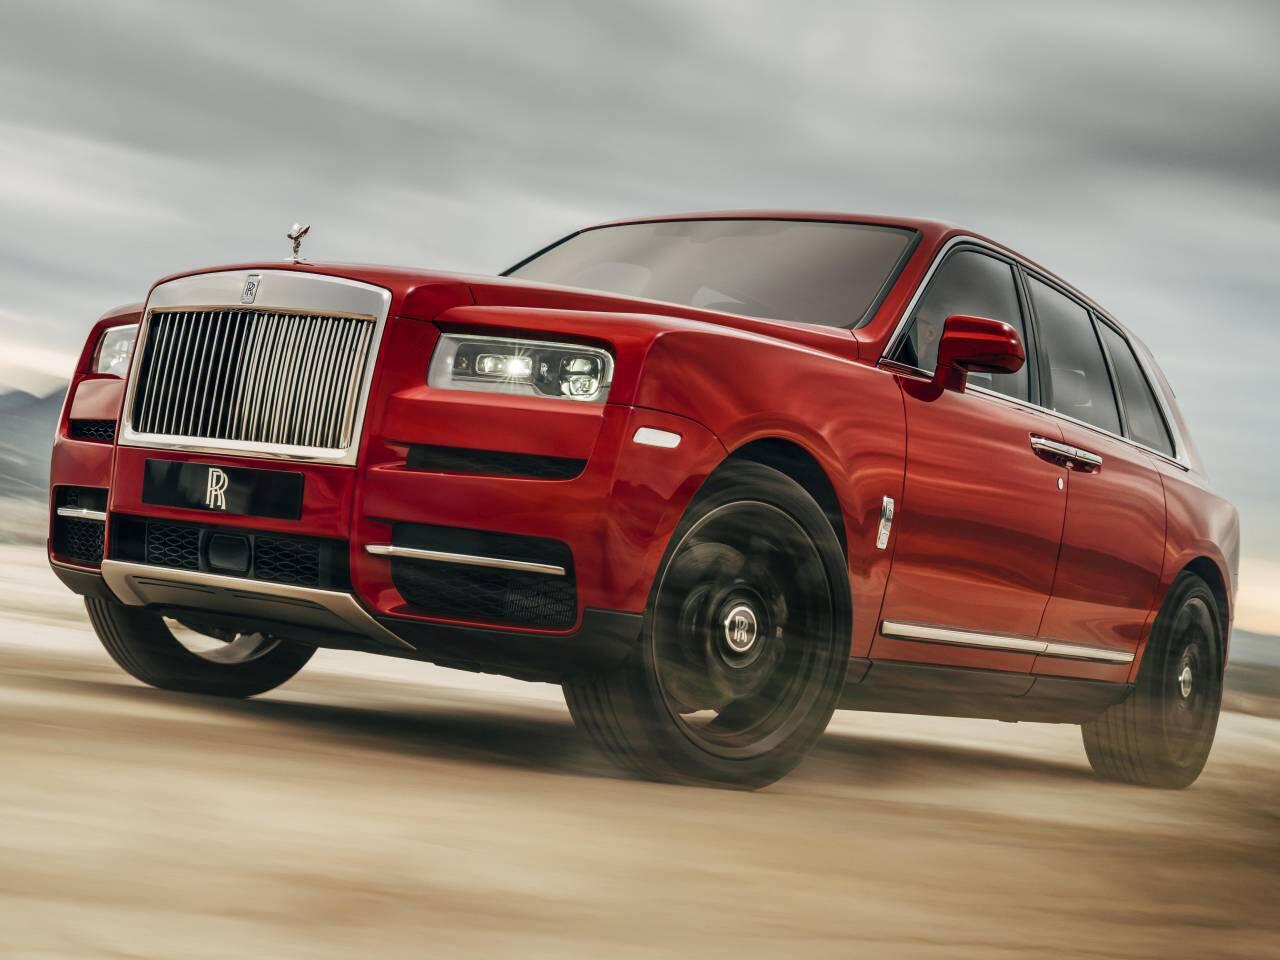 Bild zu Ankündigung Rolls-Royce Cullinan